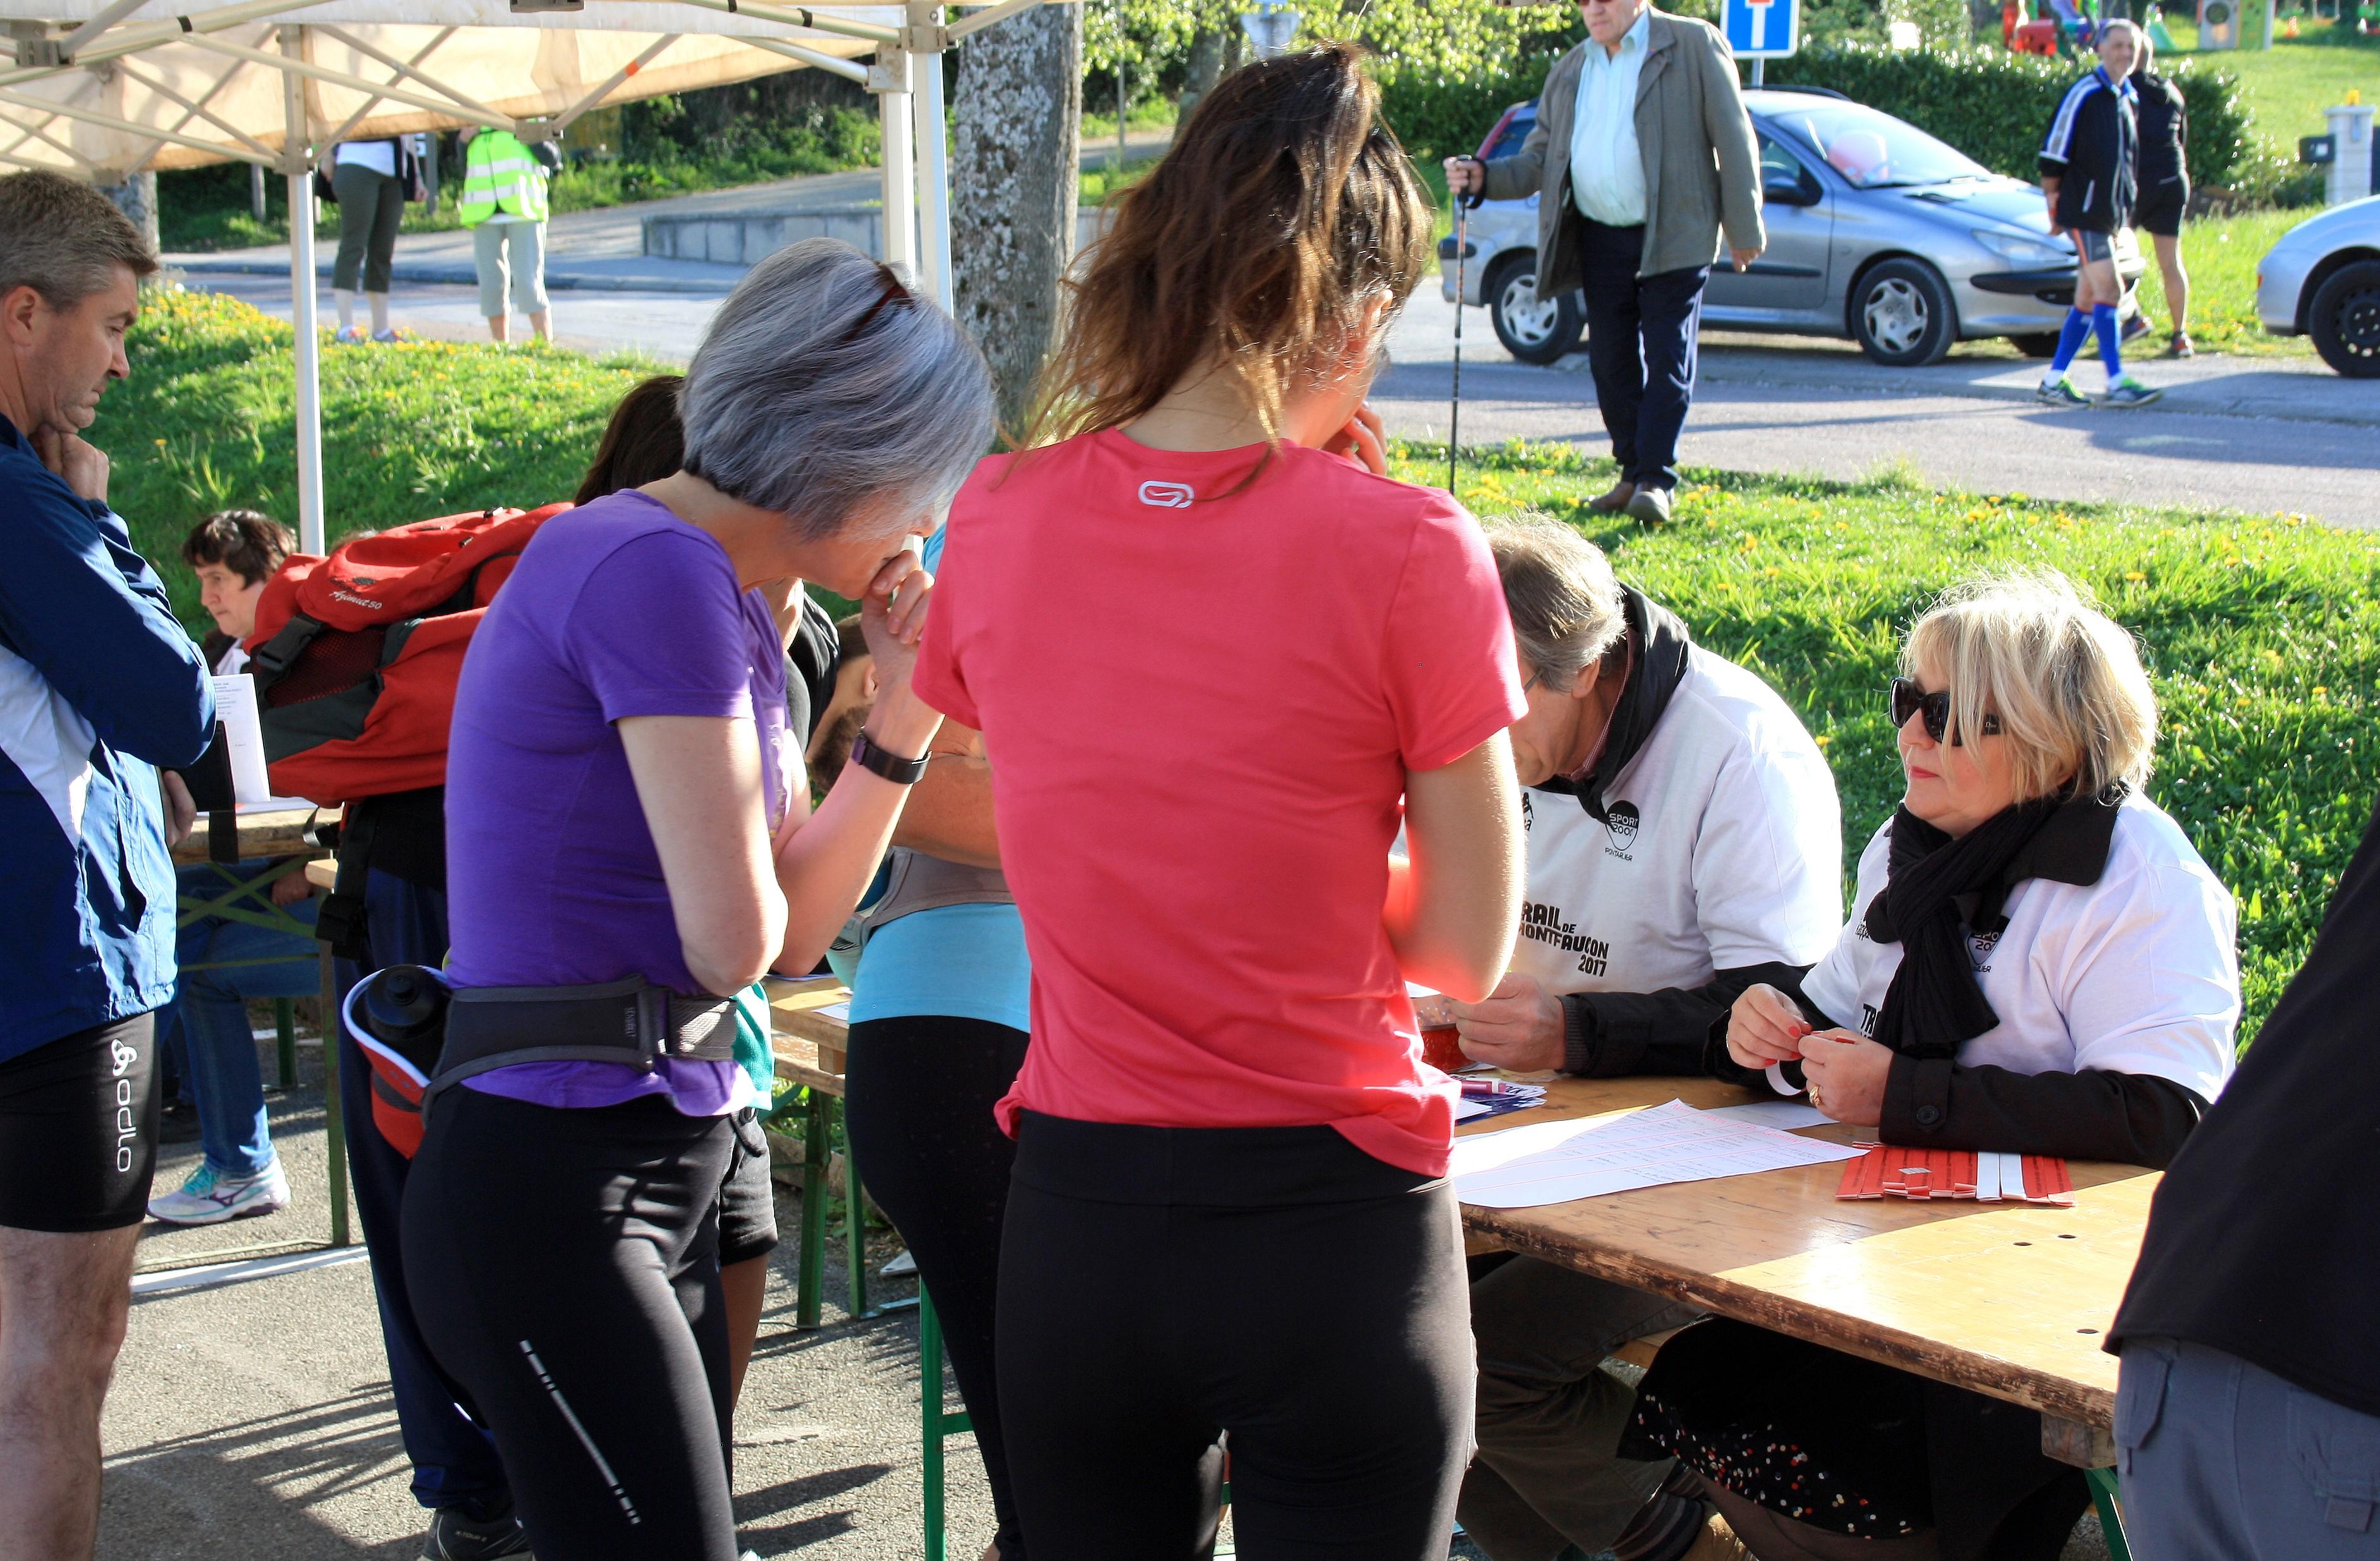 2017-04-09 - Trail-Montfaucon (69)